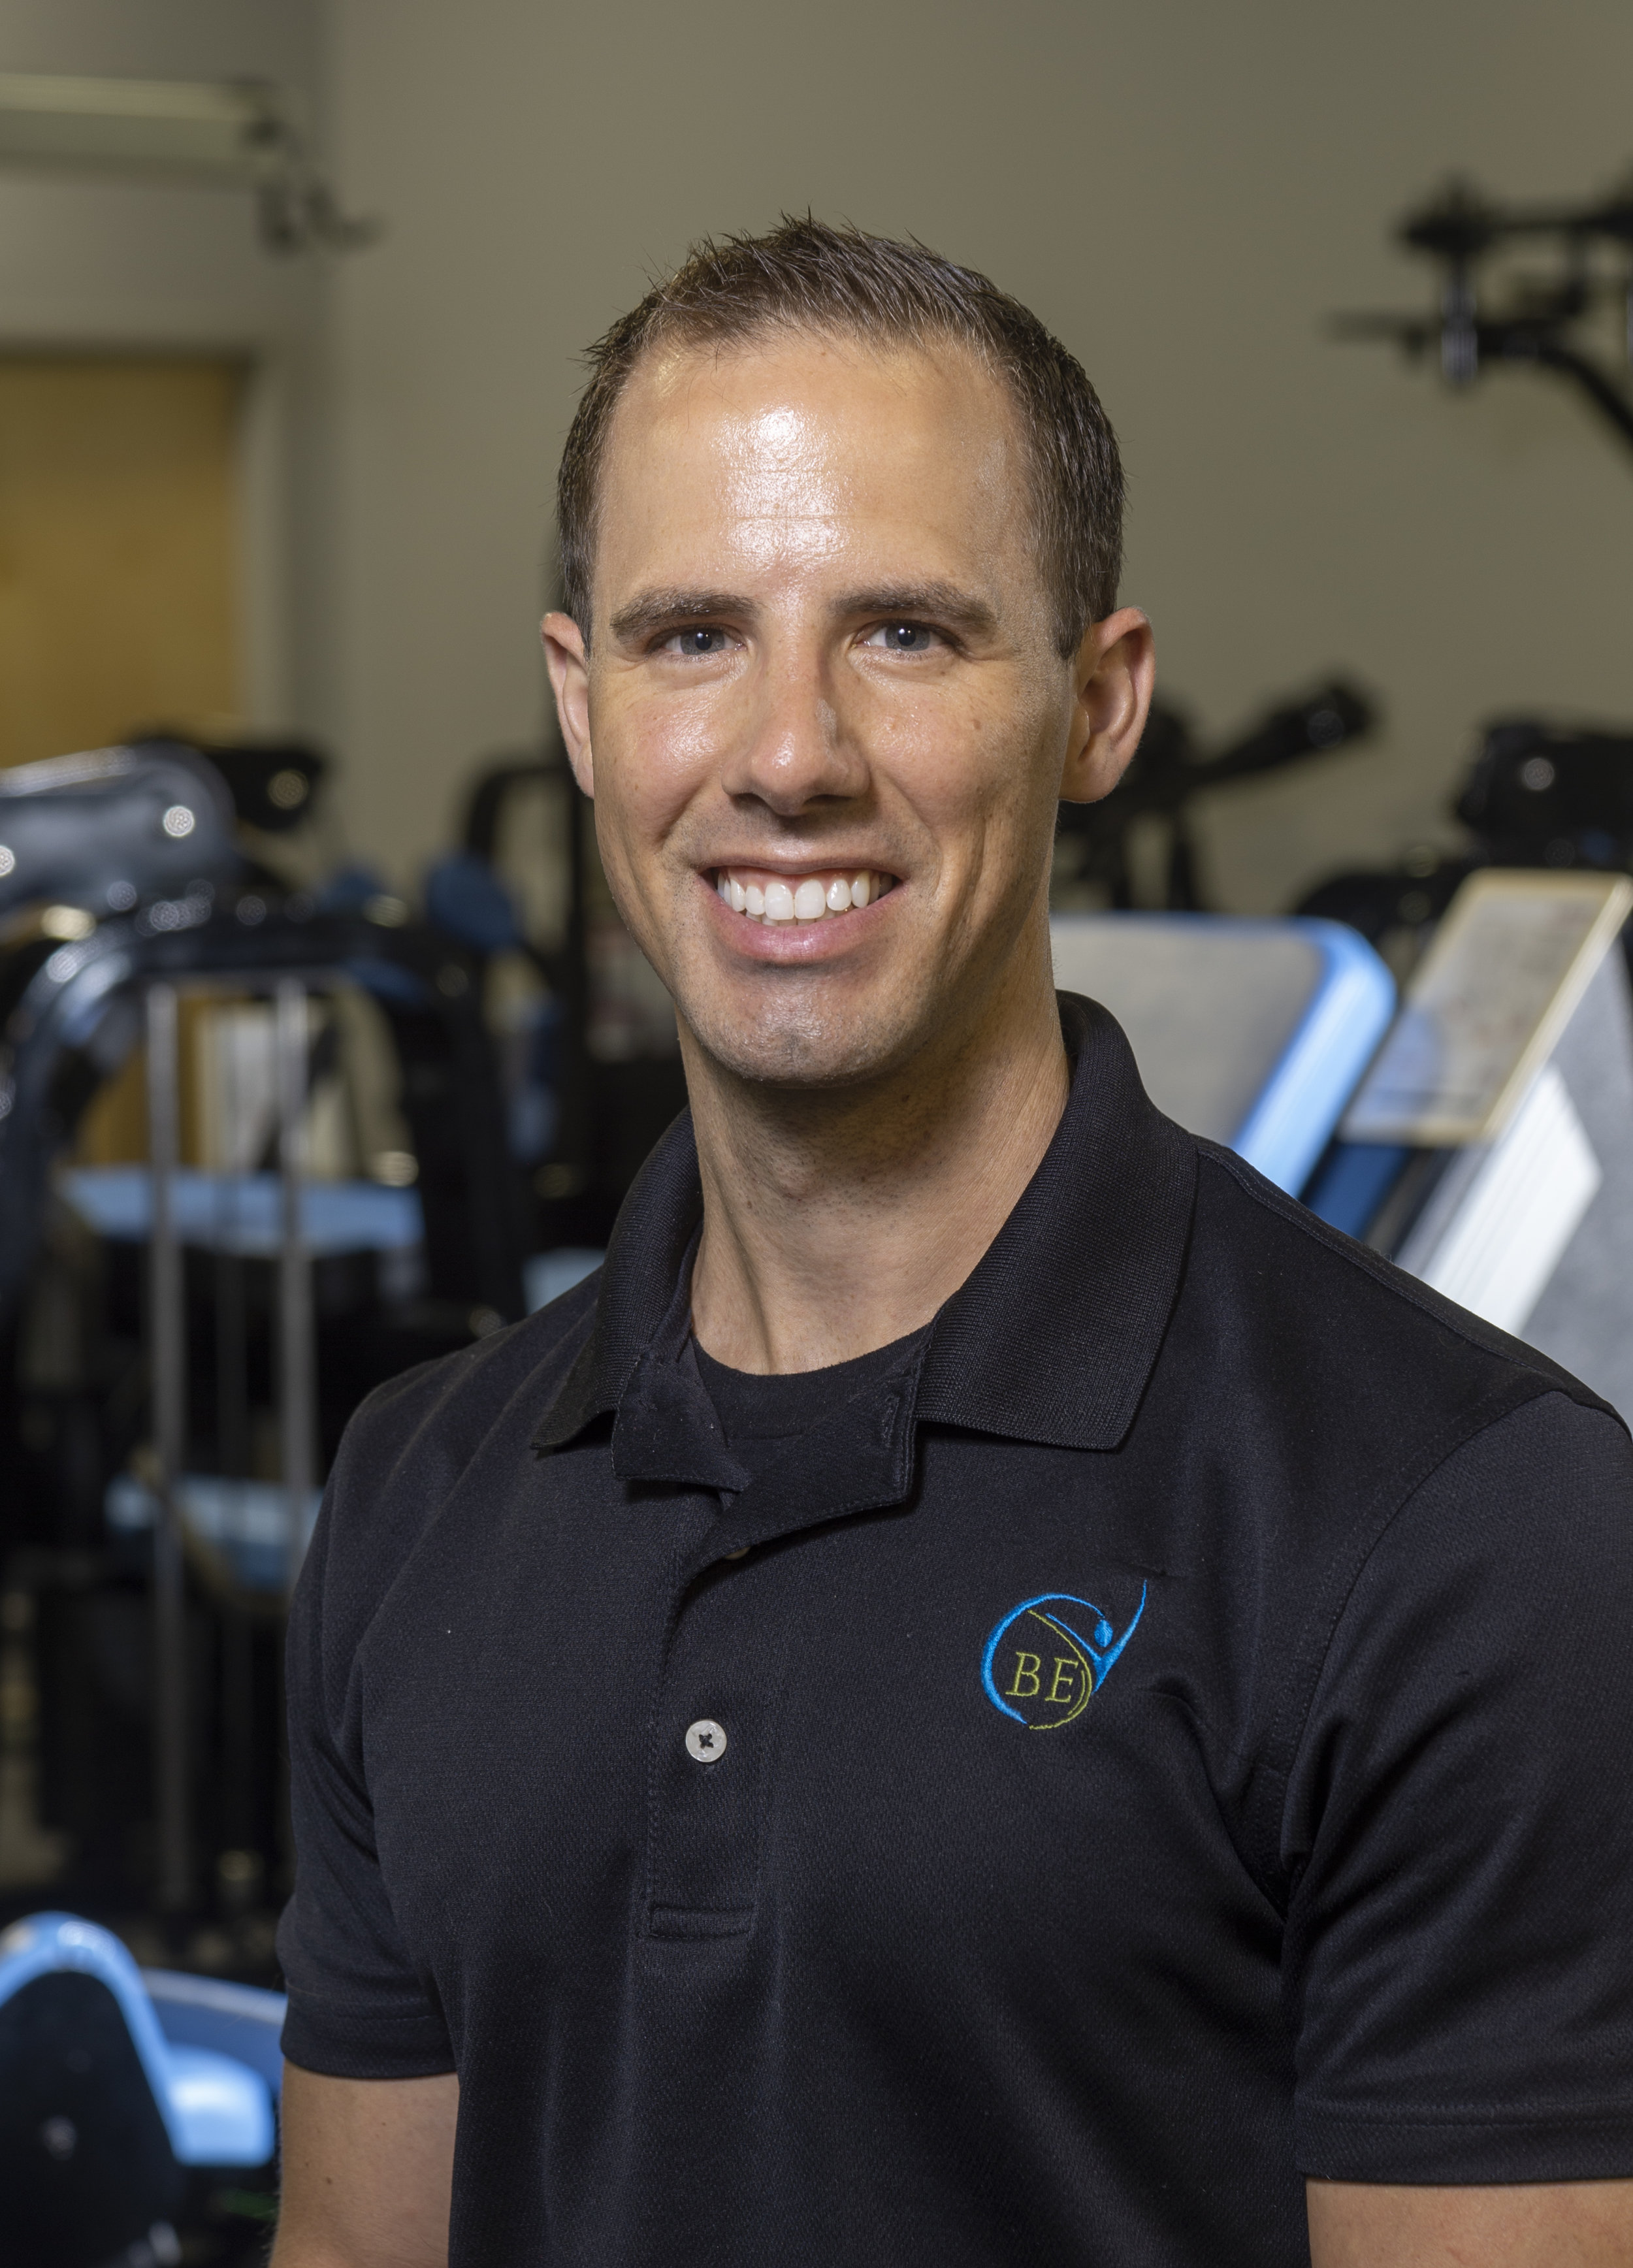 Mark Radio, Body Elite GM and Personal Trainer